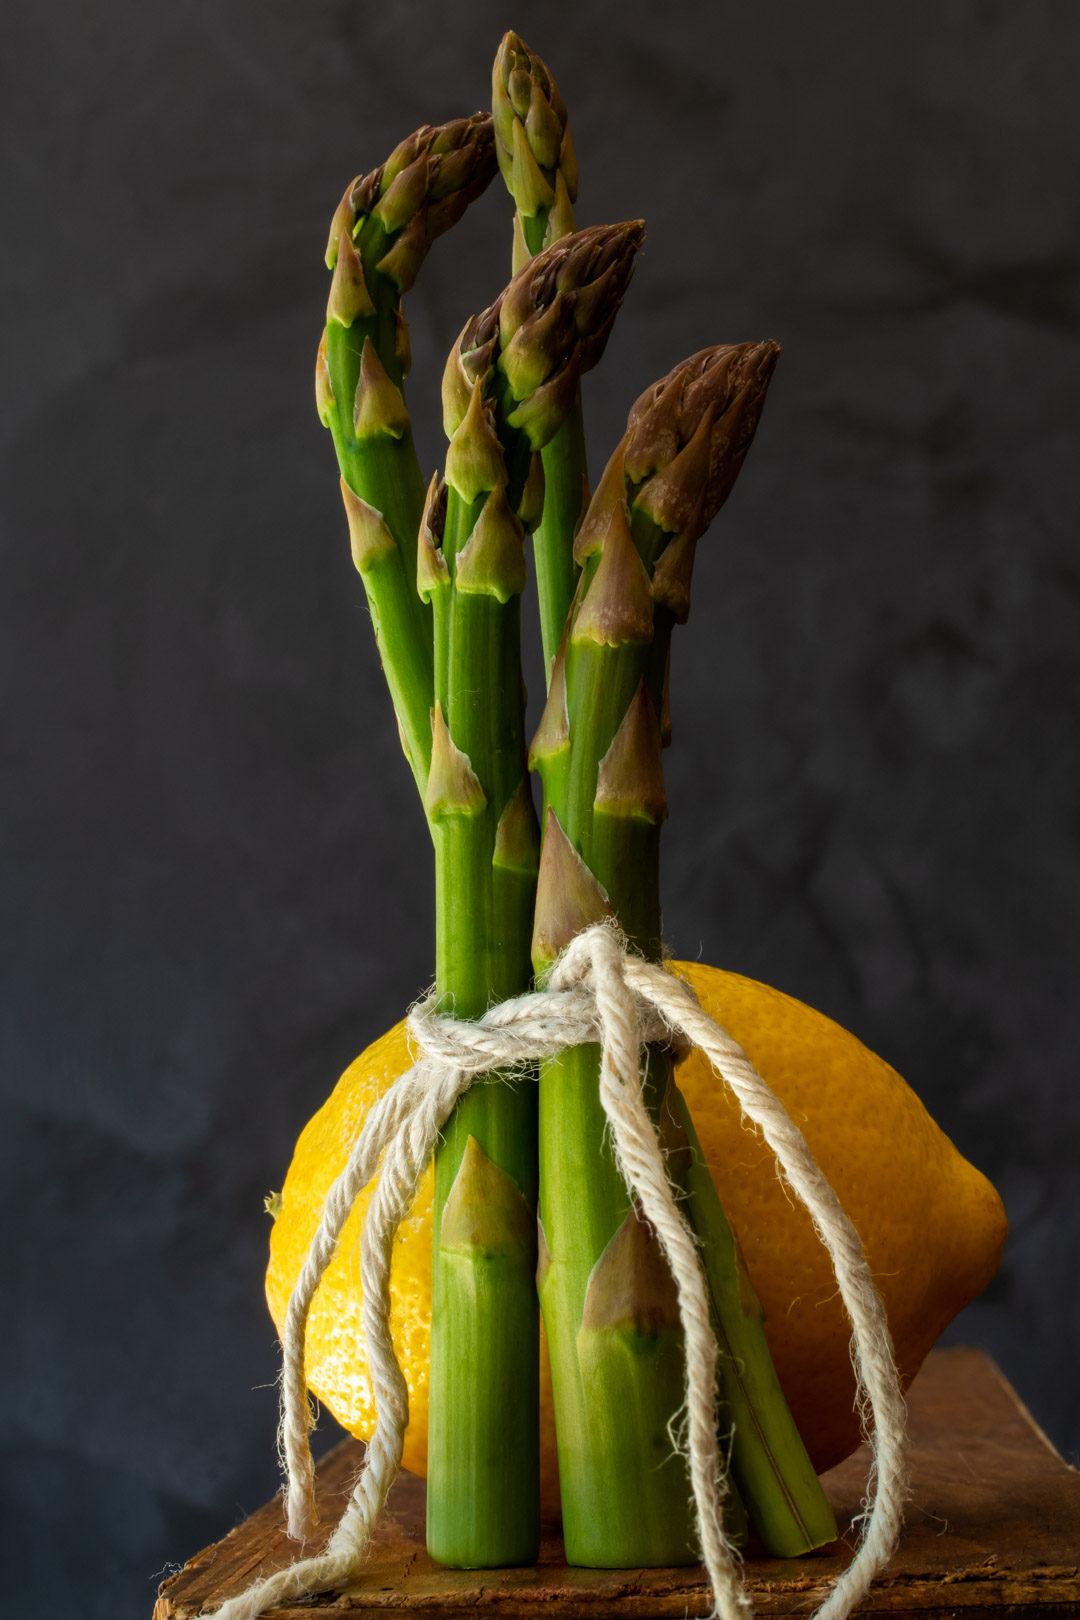 asparagus & lemon tart: asparagus and lemon still life on wooden box